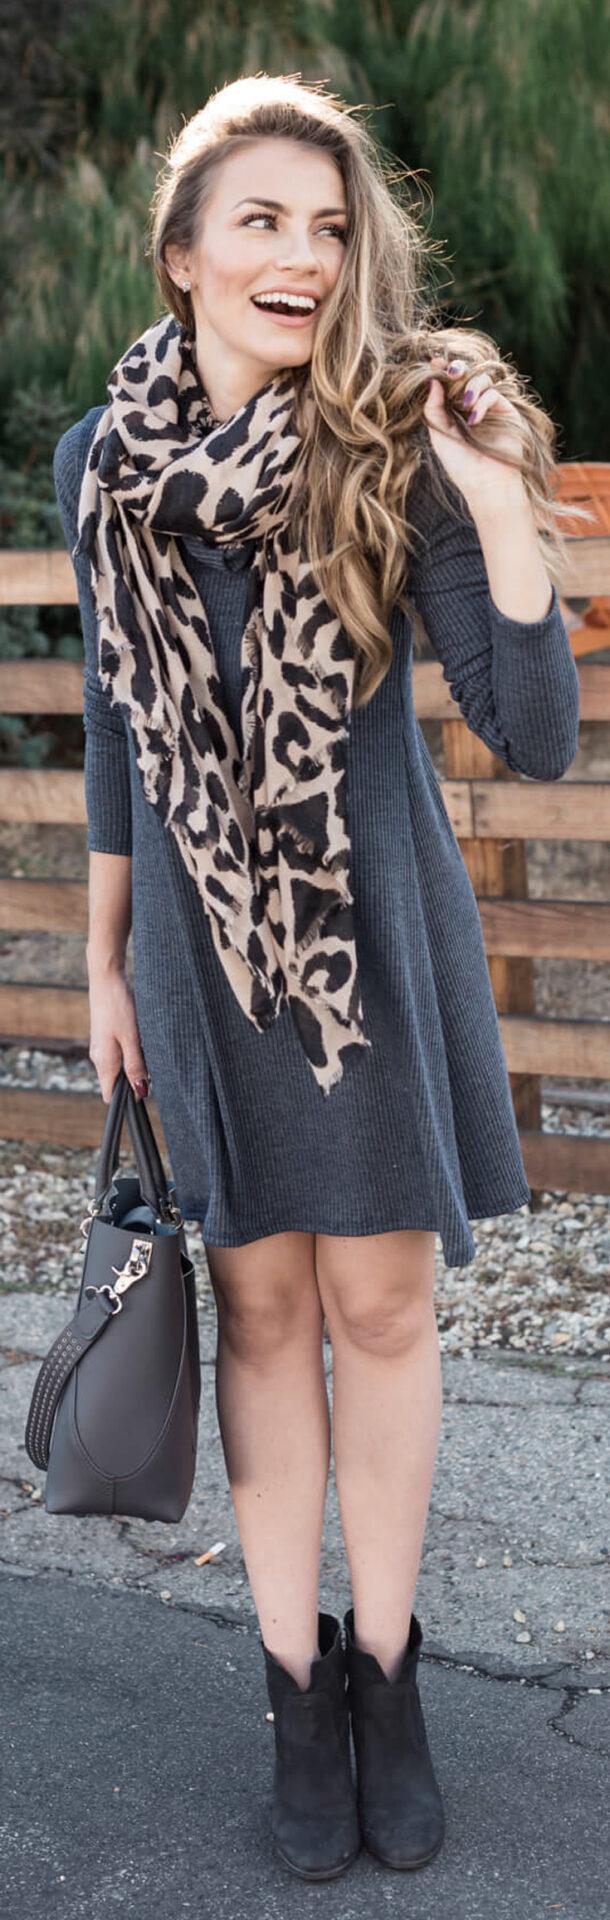 Angela Lanter Rib Knit Cowl Shift Dress - Leopard Print Scarf - Similar Black Booties - Zac Zac Posen Handbag